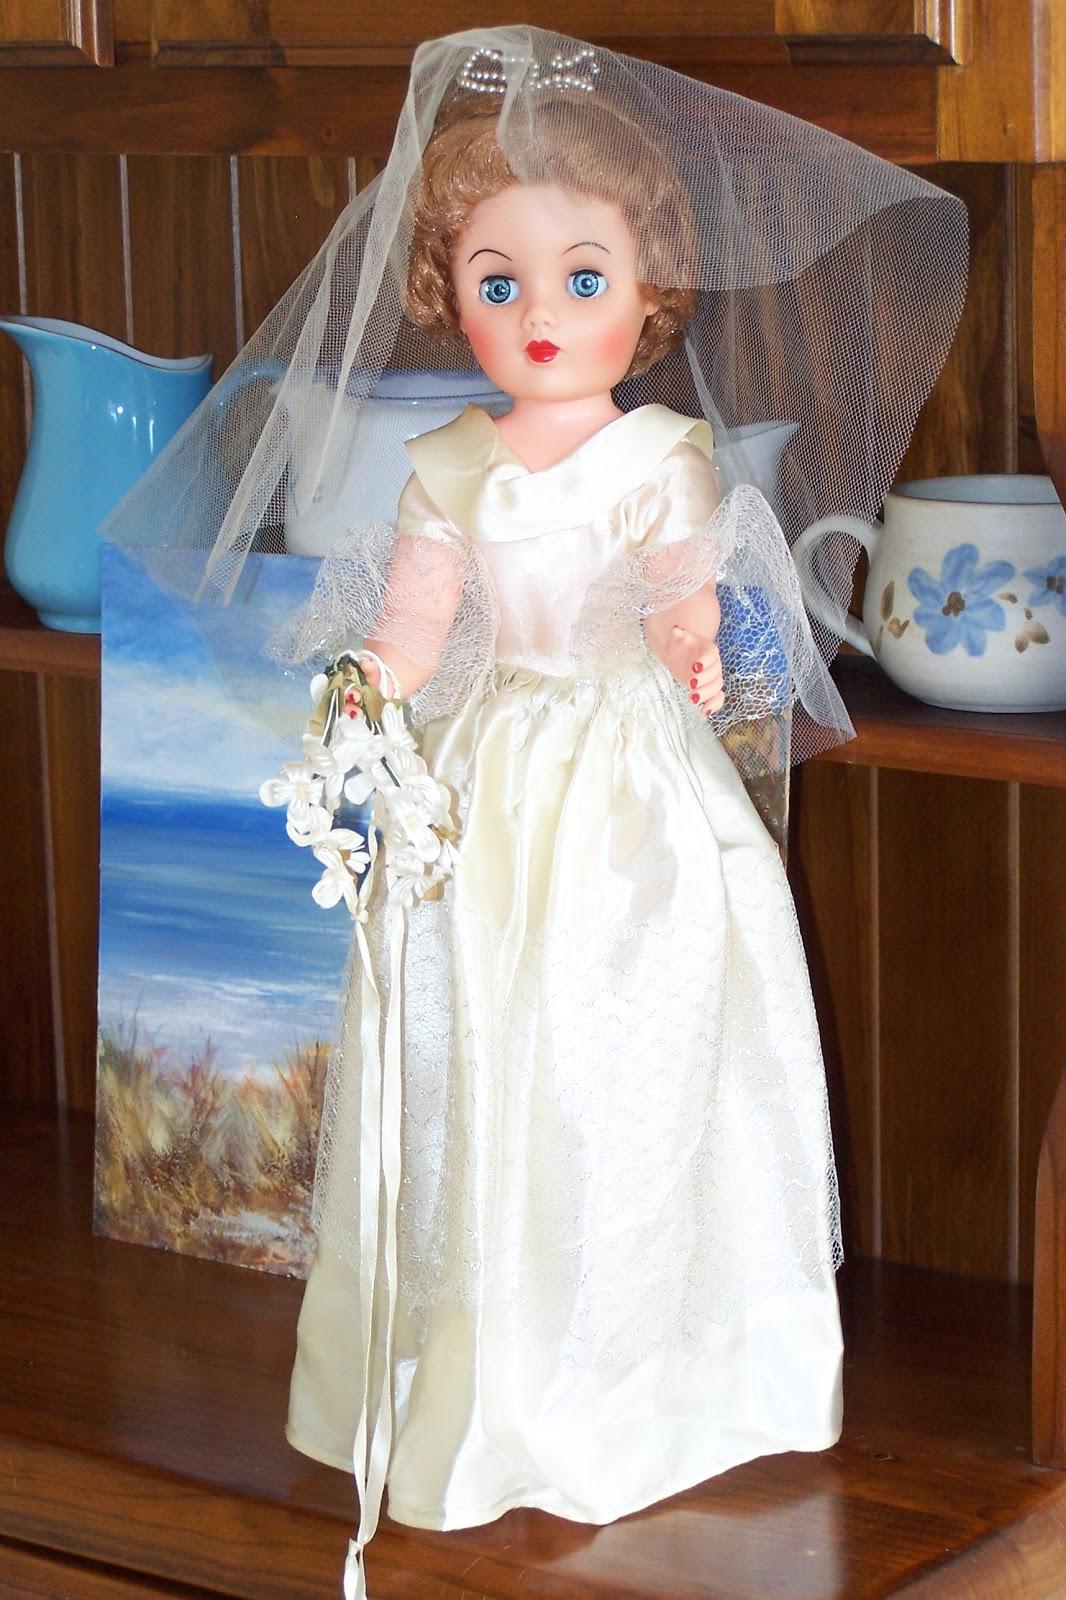 Lizzie S Arty Crafty N Dolls Dolls A New Dress Amp Hat